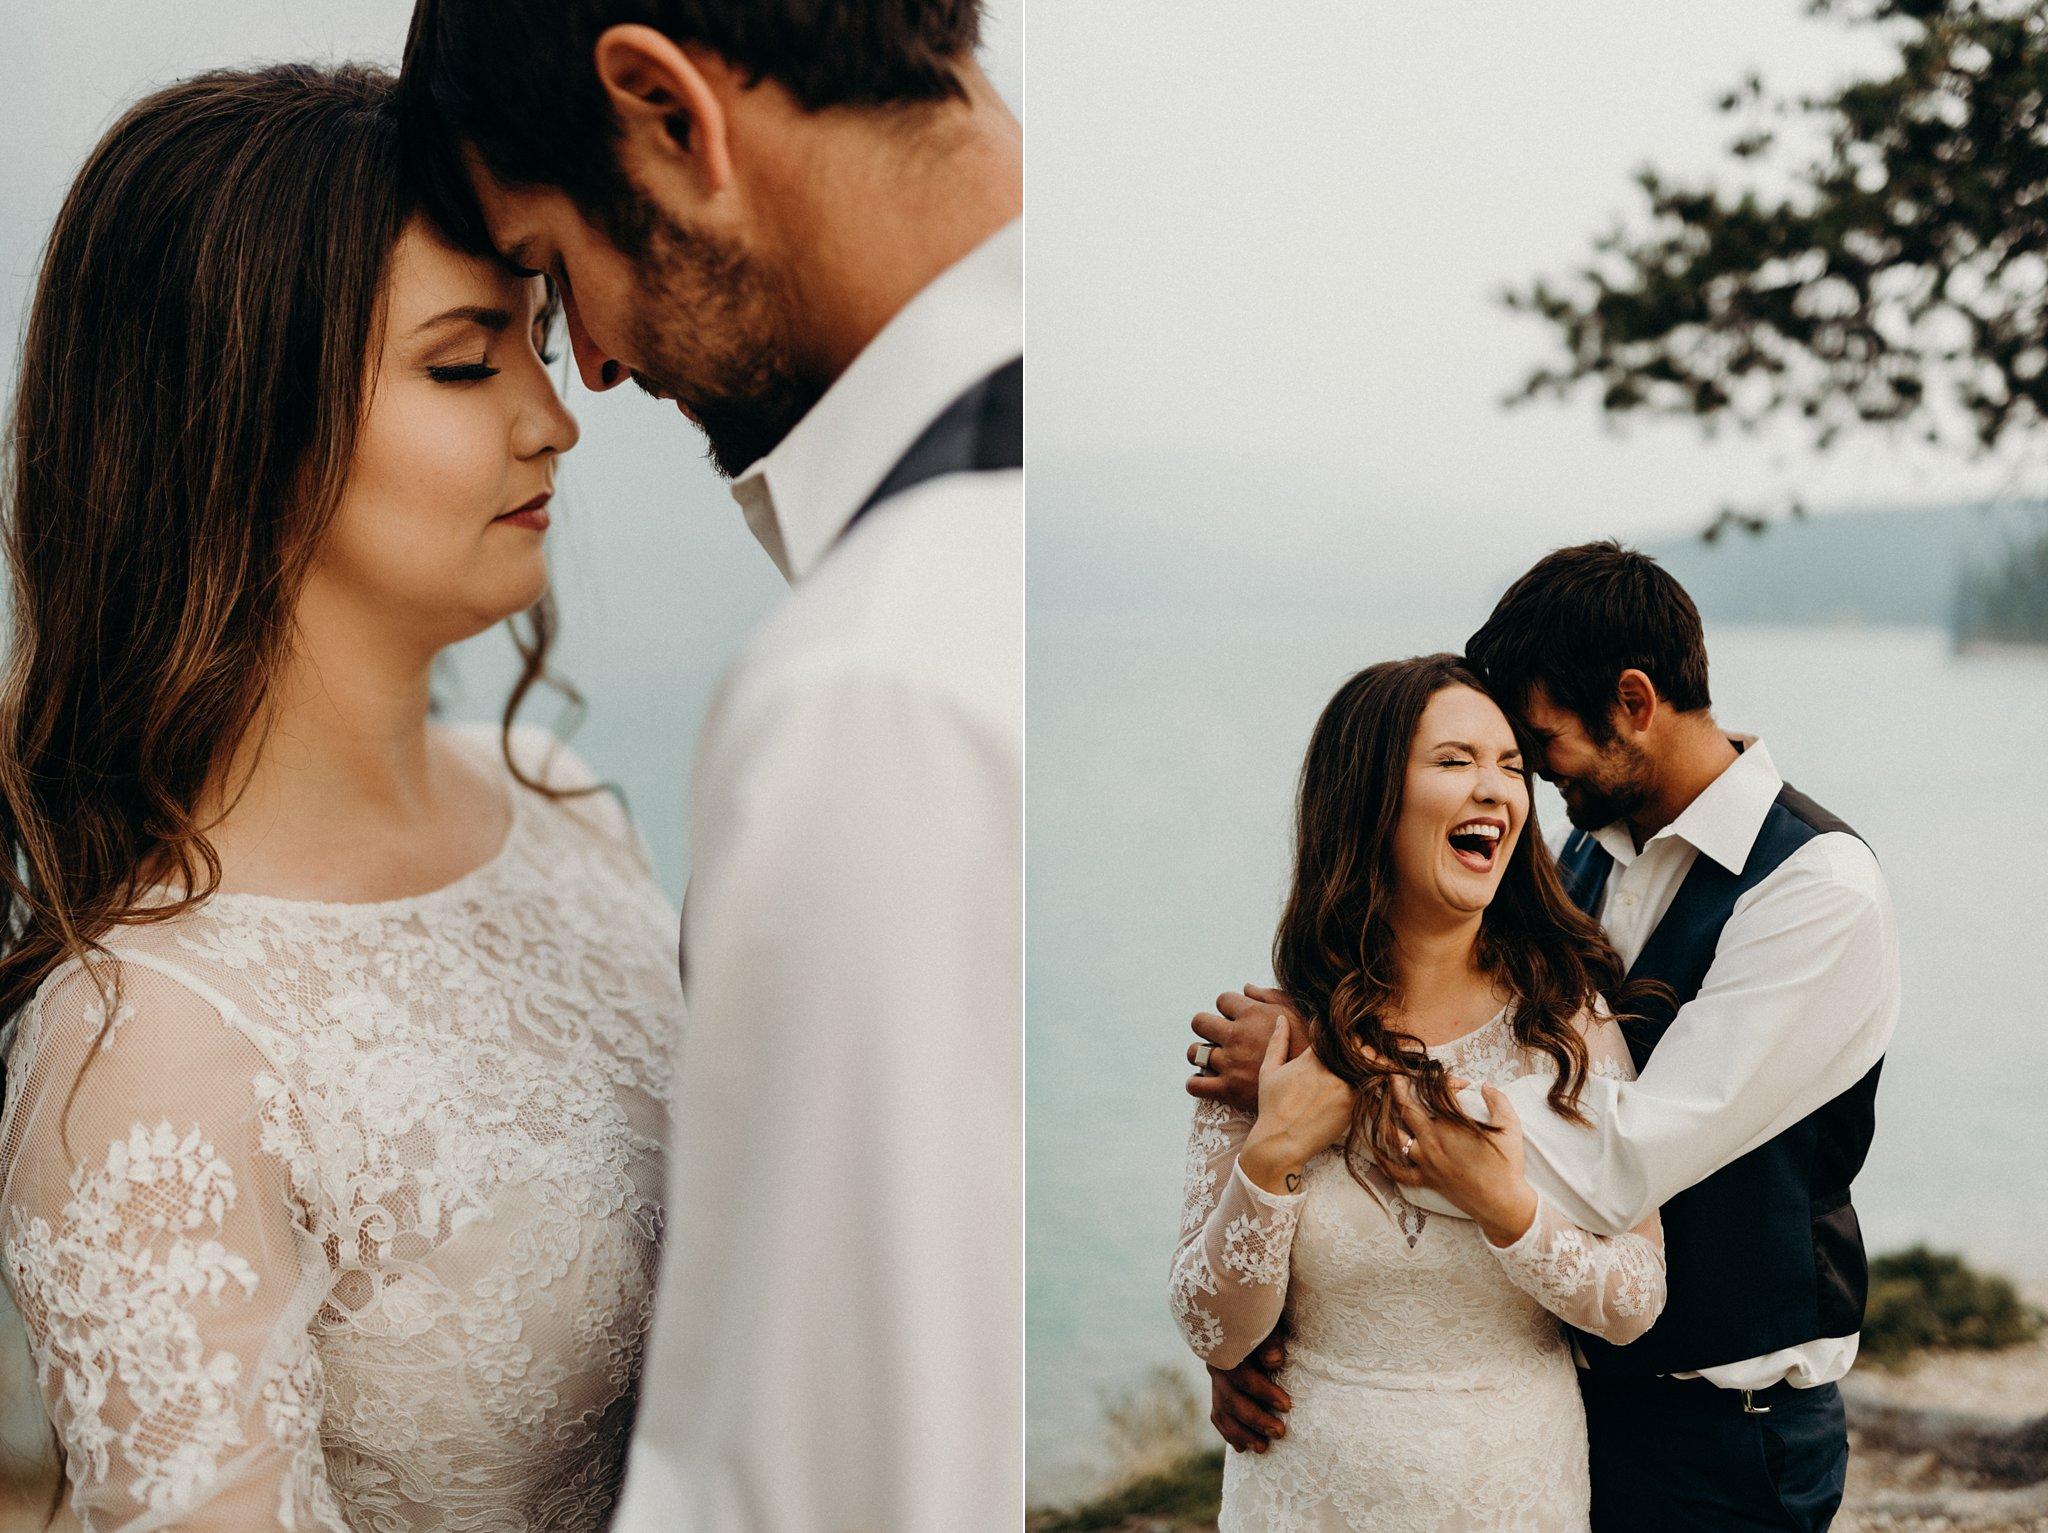 kaihla_tonai_intimate_wedding_elopement_photographer_6738.jpg